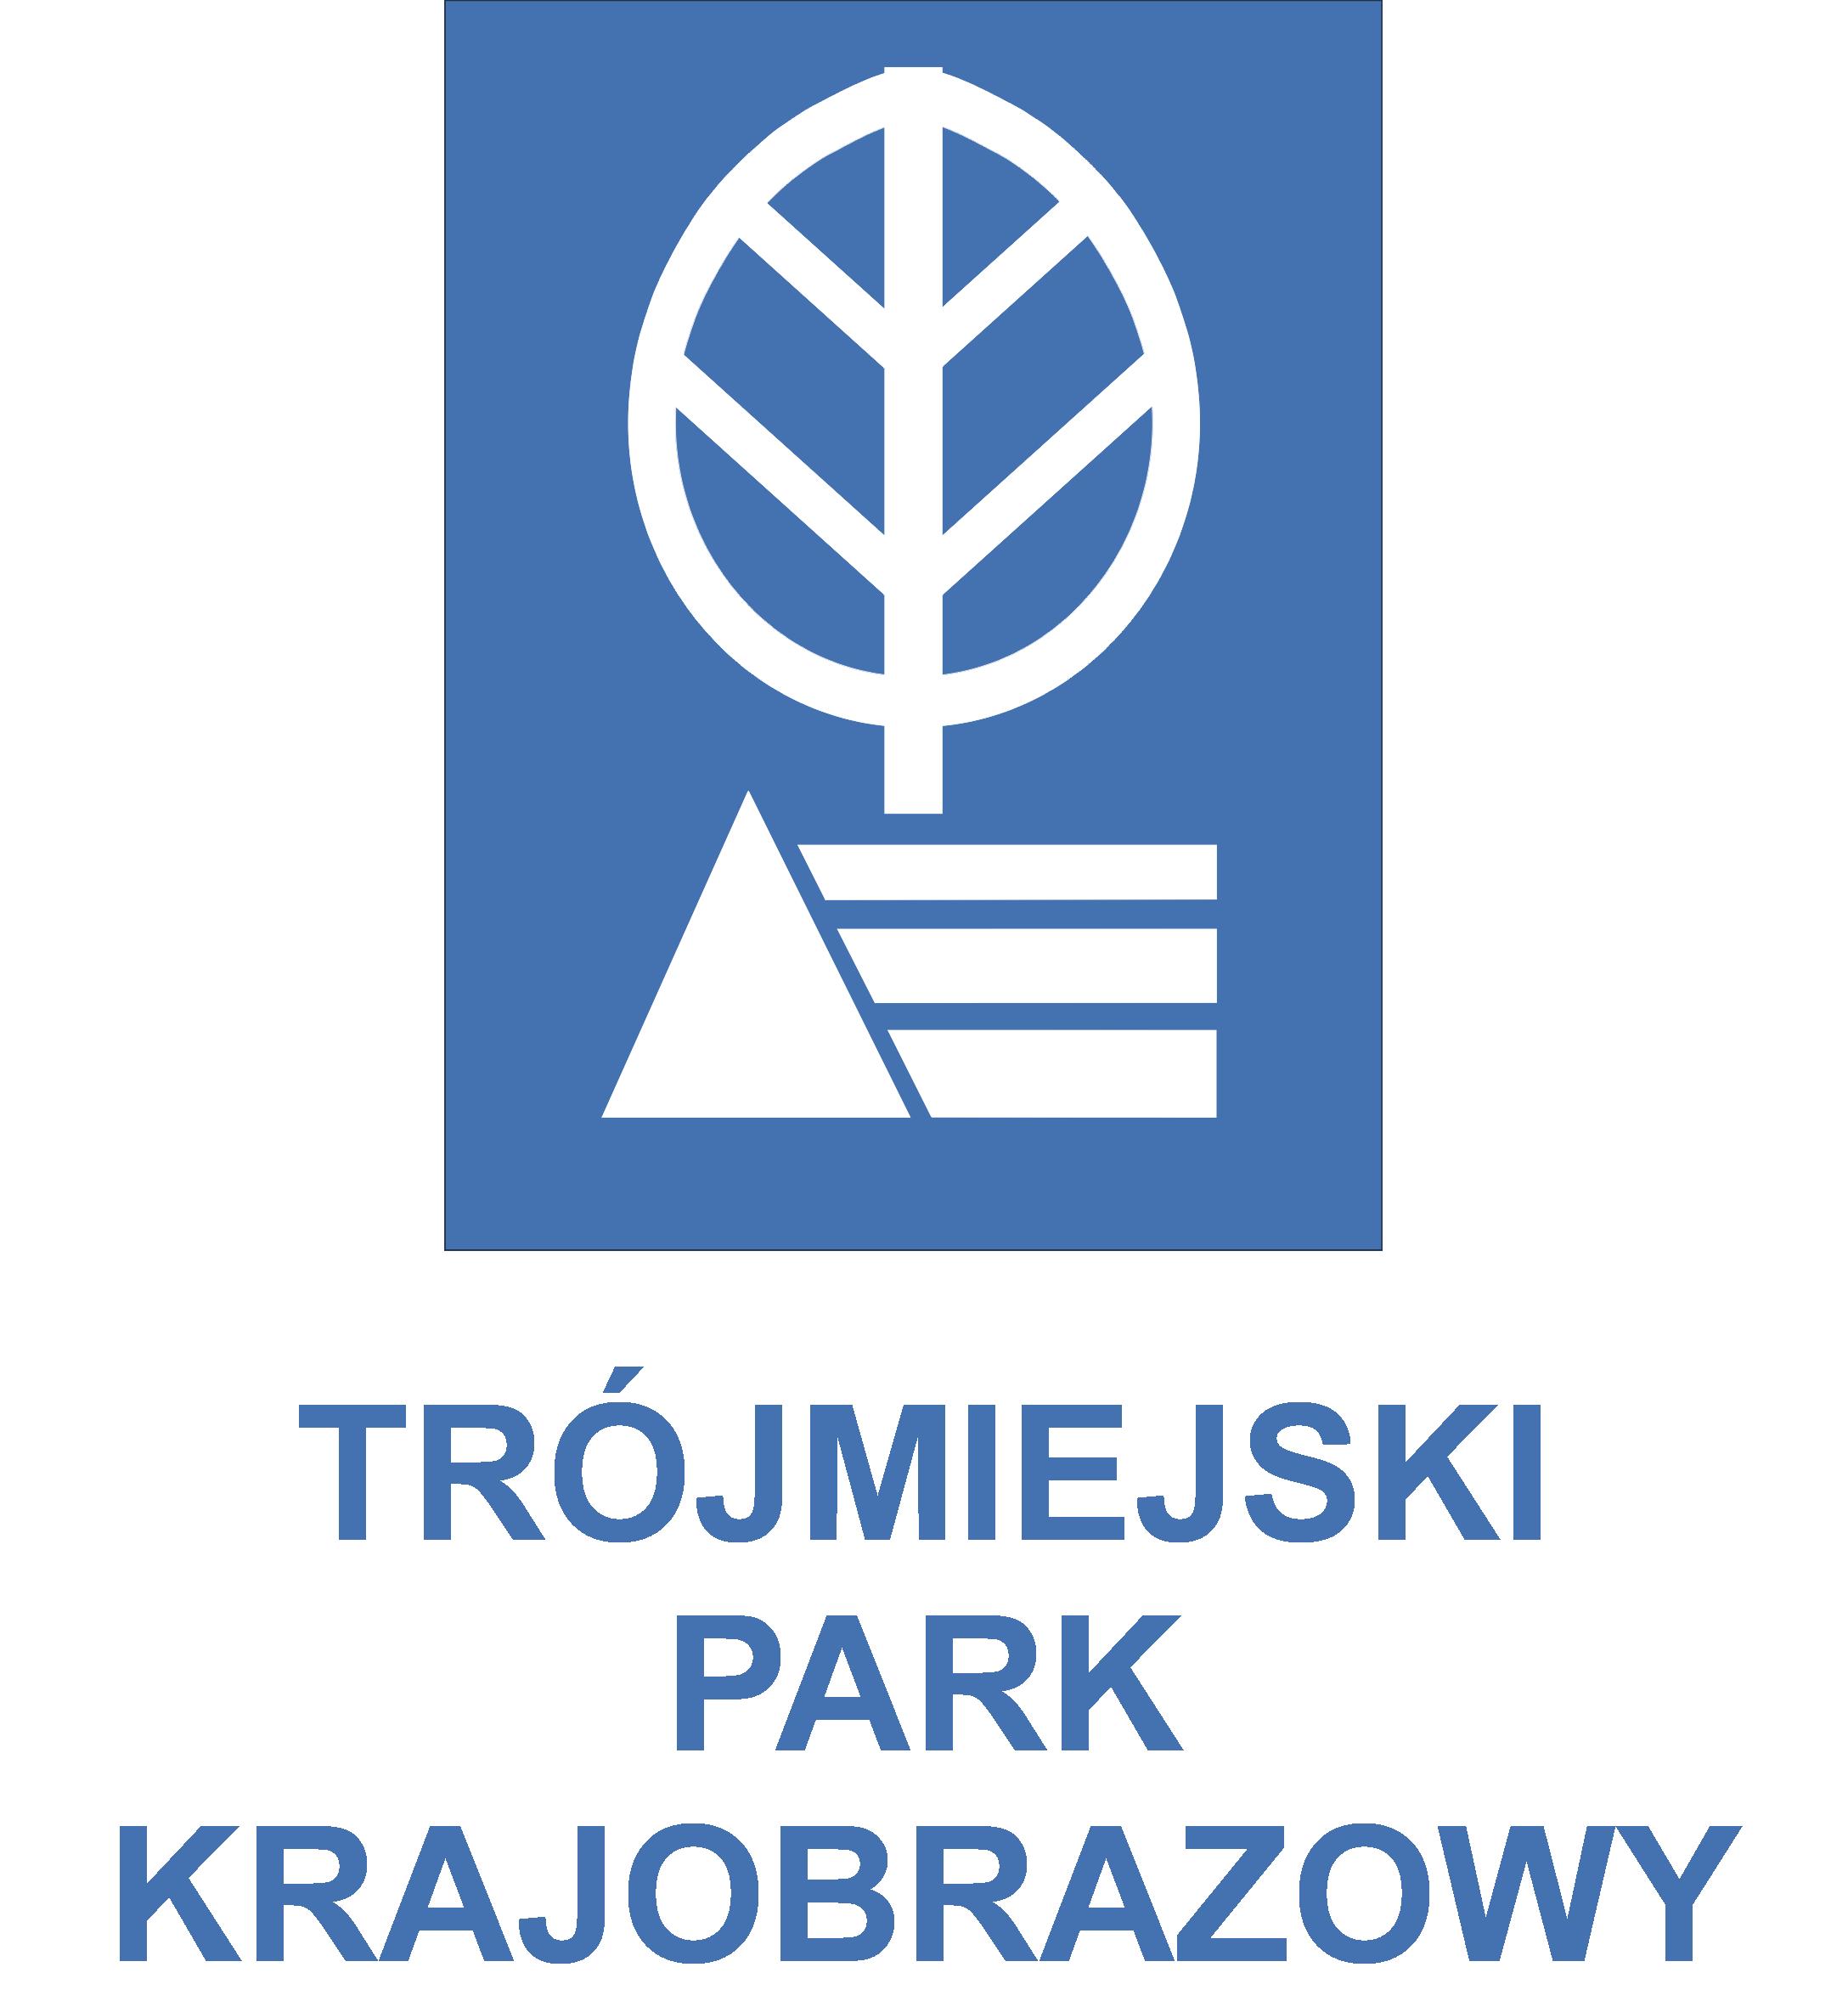 logo_napis_dol_tpk